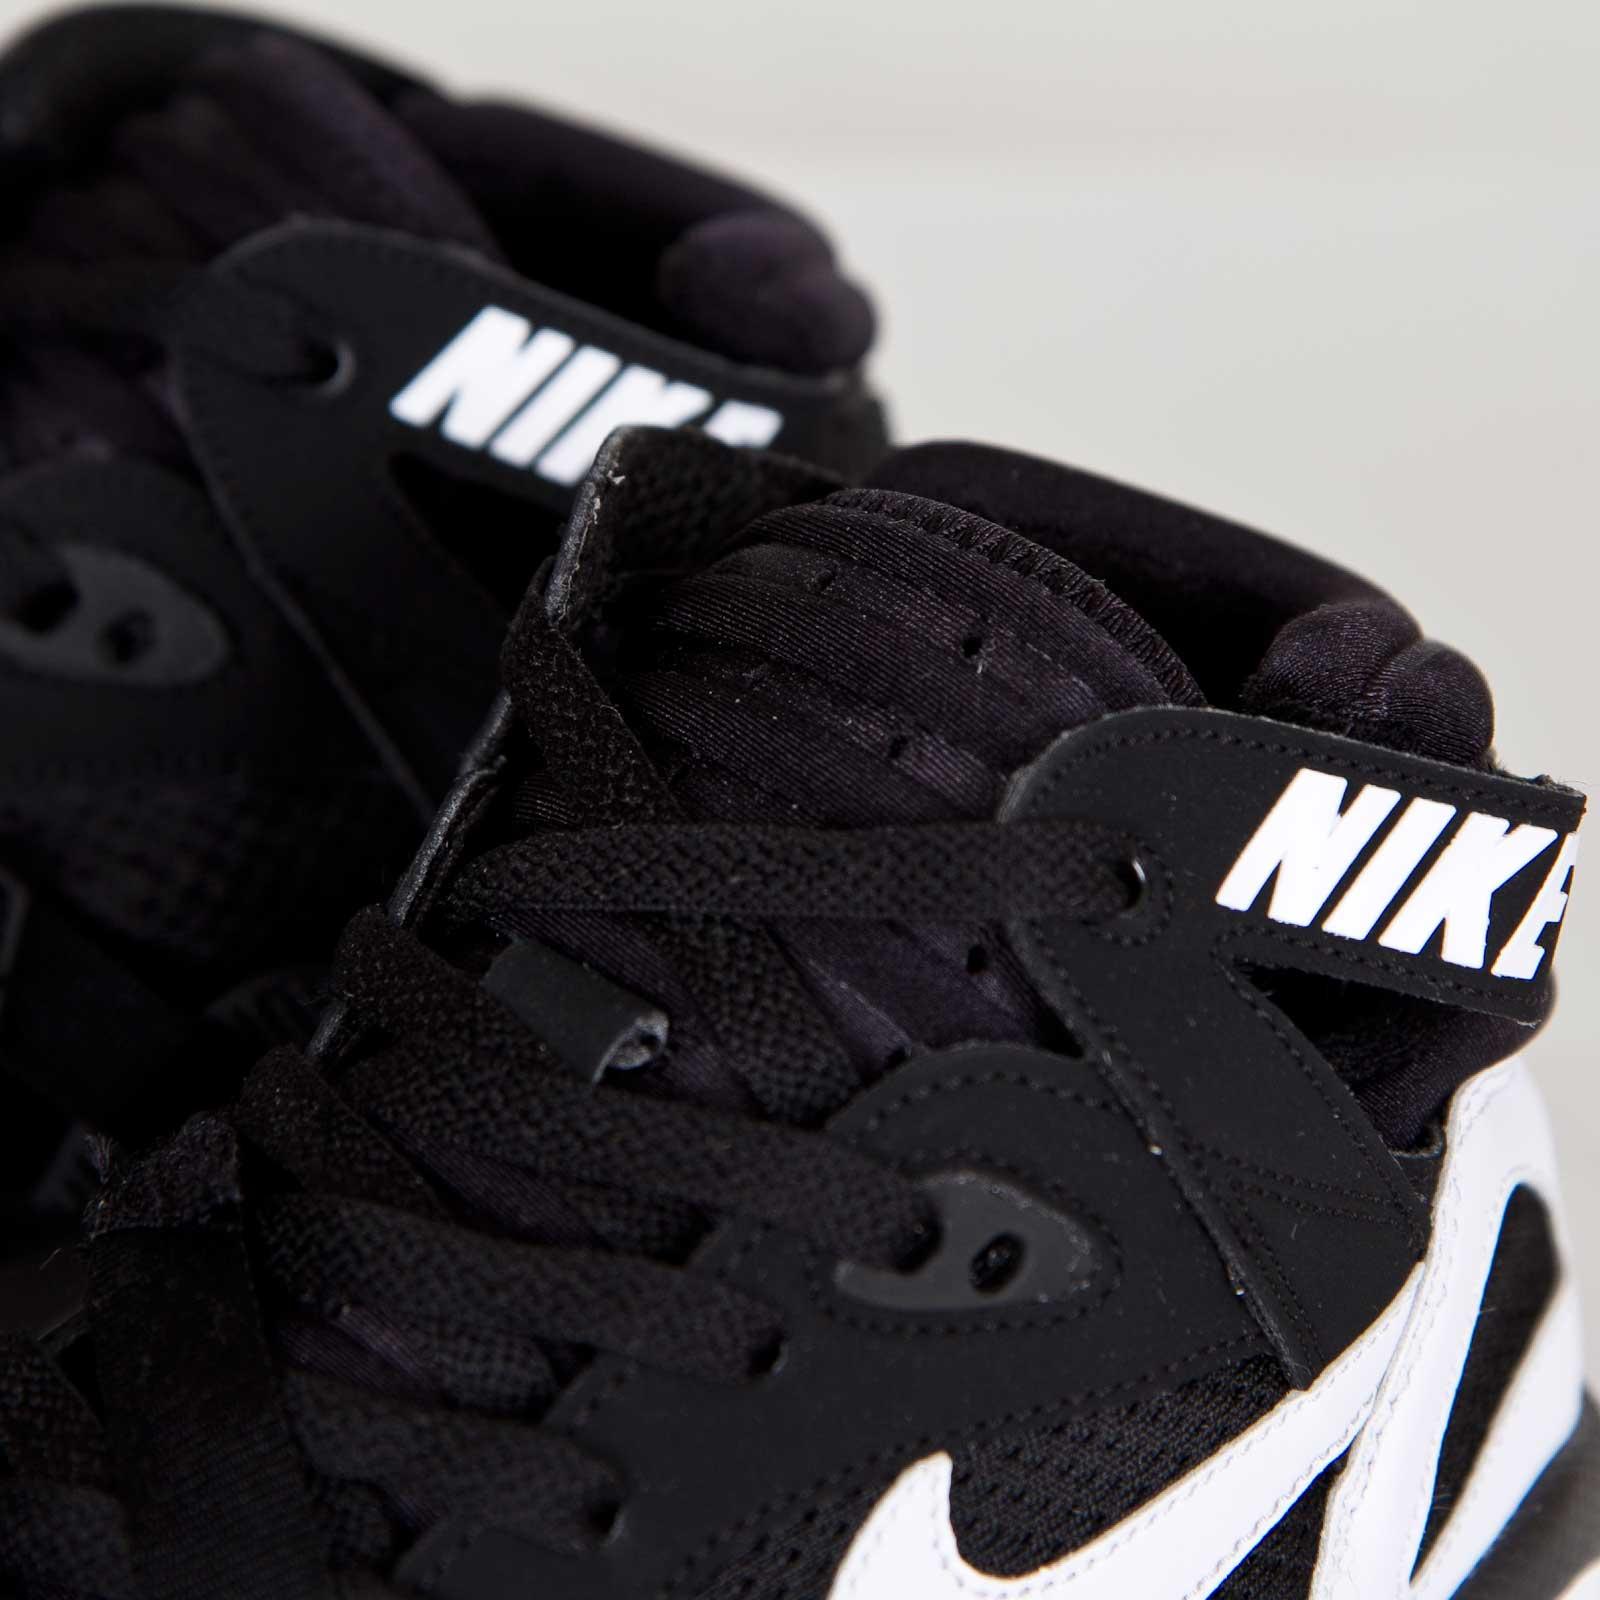 online store 104de a4a9c ... Nike Air Trainer Max 91 ...